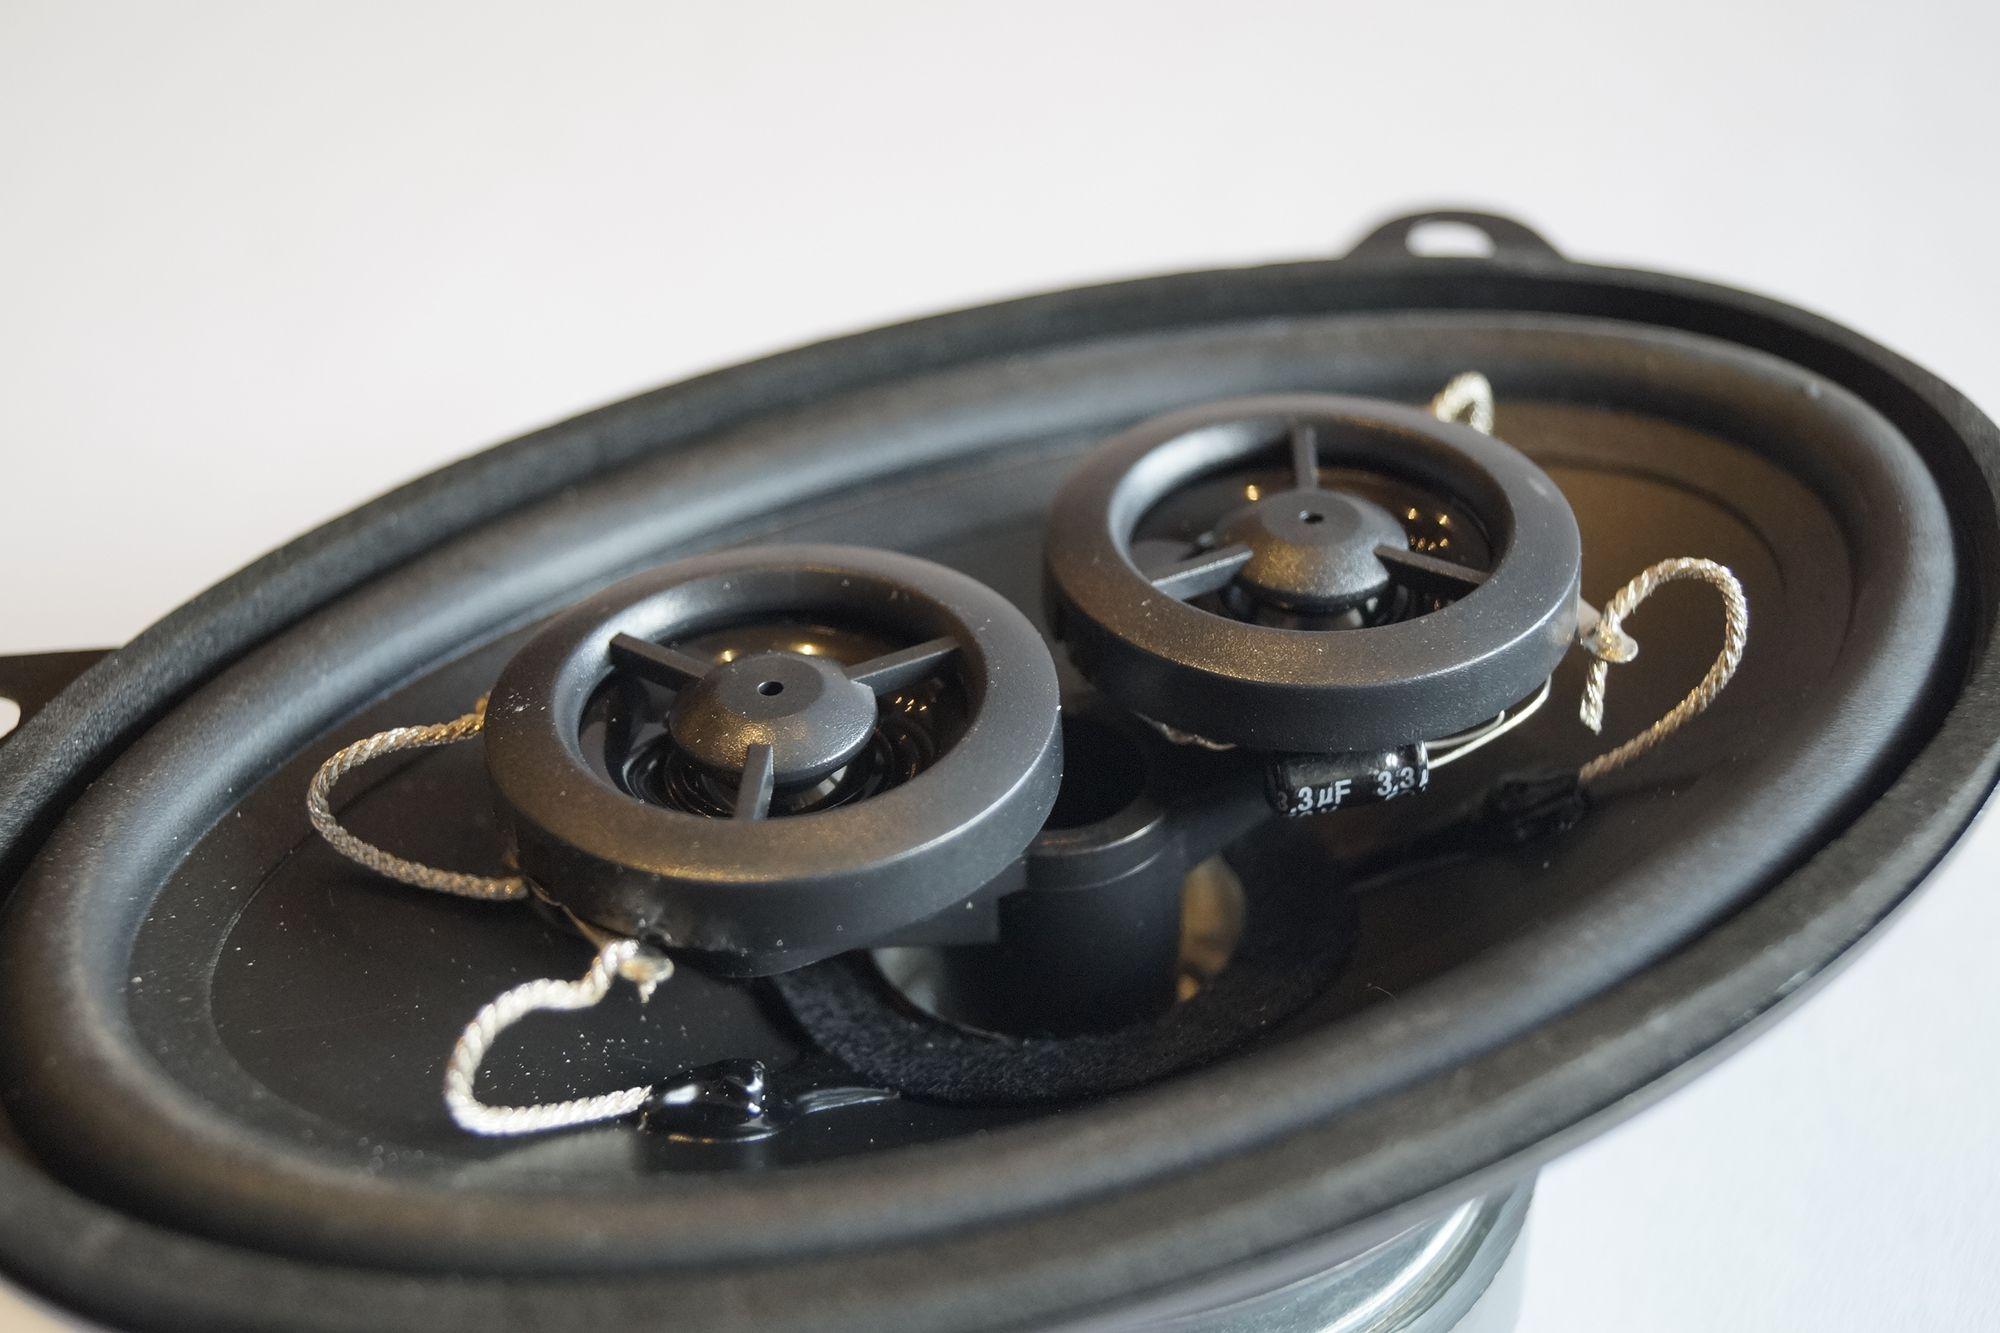 PG Audio 9x15 cm 2 Wege Stereo Koax Lautsprecher 4x6 Zoll für  Oldtimer Youngtimer – Bild 2